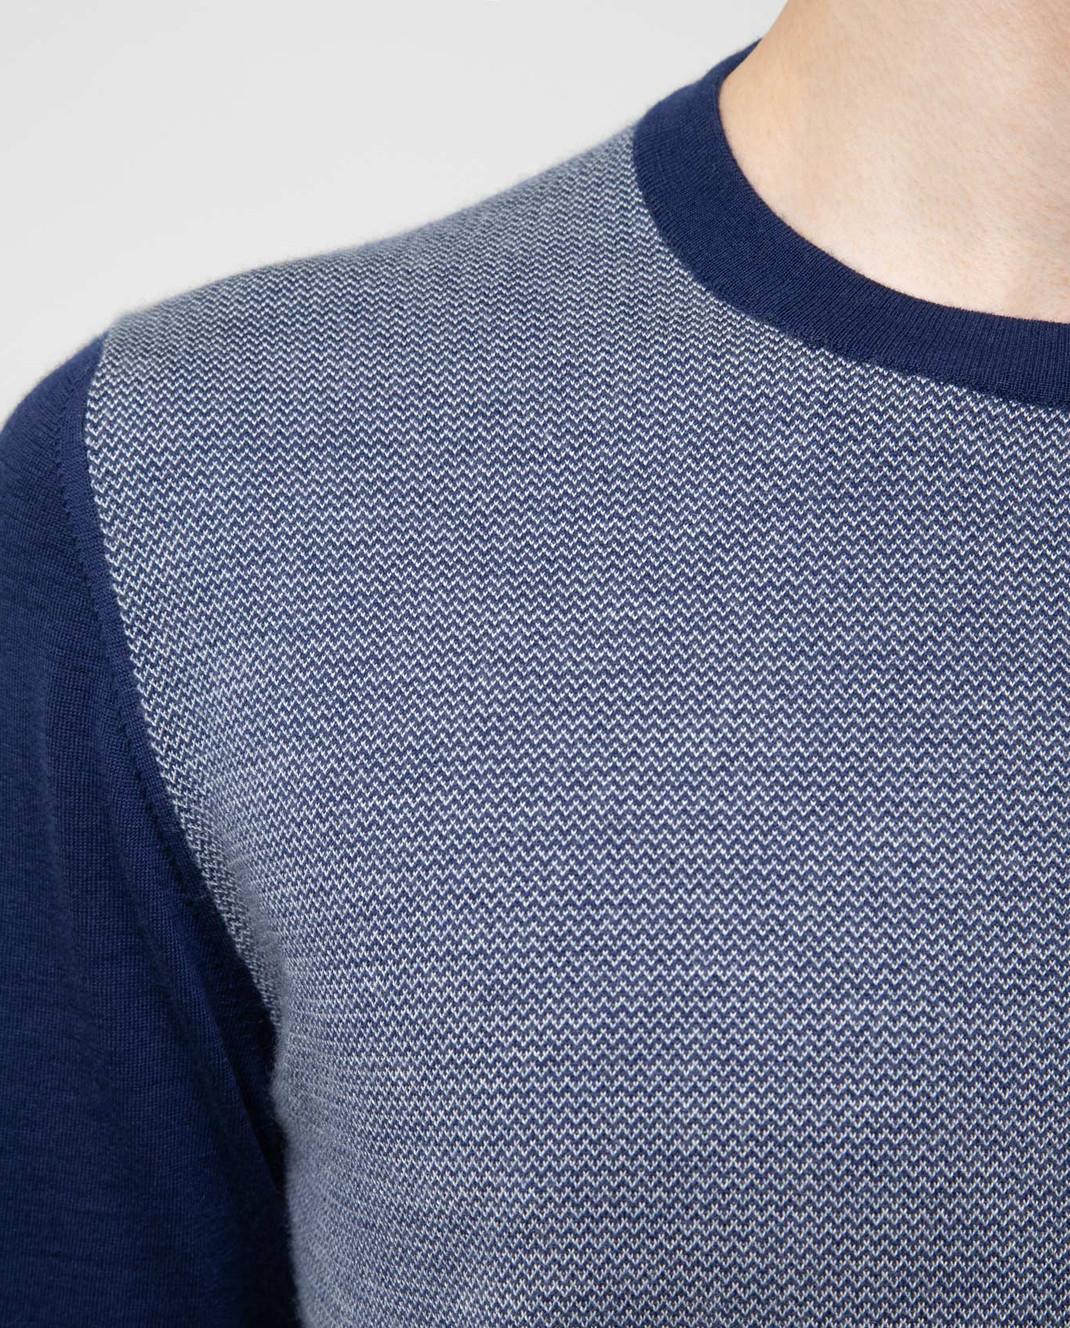 Kiton Темно-синий джемпер из кашемира и шелка изображение 5